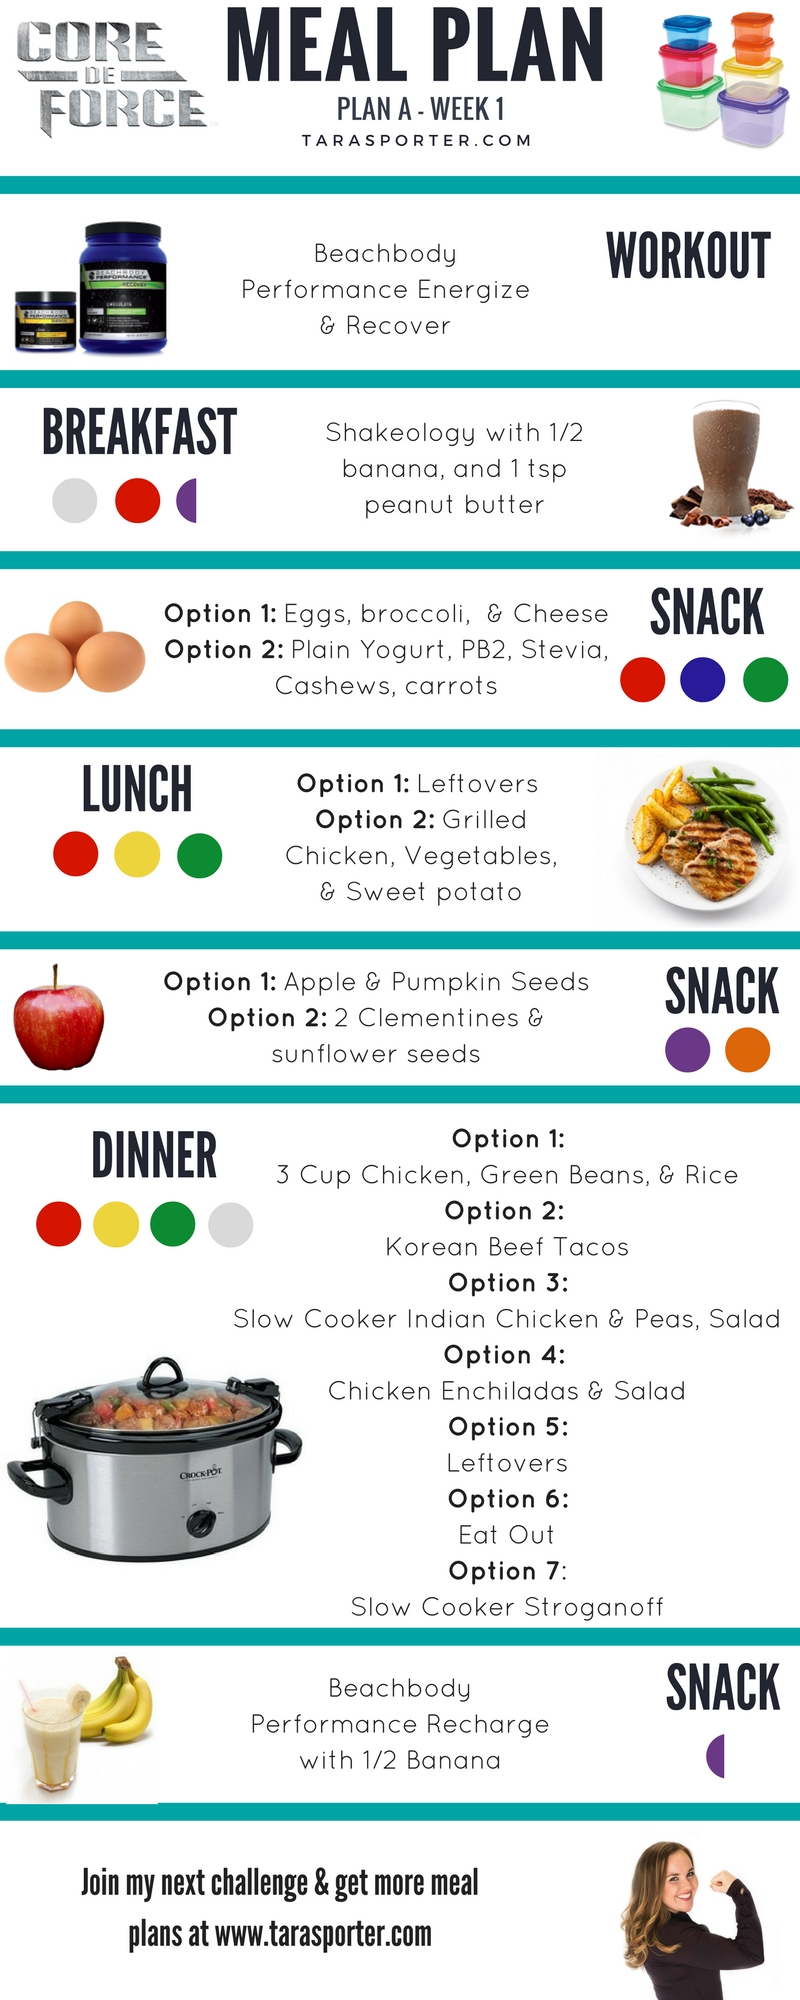 Core De Force Meal Plan Week 1 Weightlossbeforeandafter 21 Day Fix Meals 21 Day Fix Meal Plan Beachbody Meal Plan